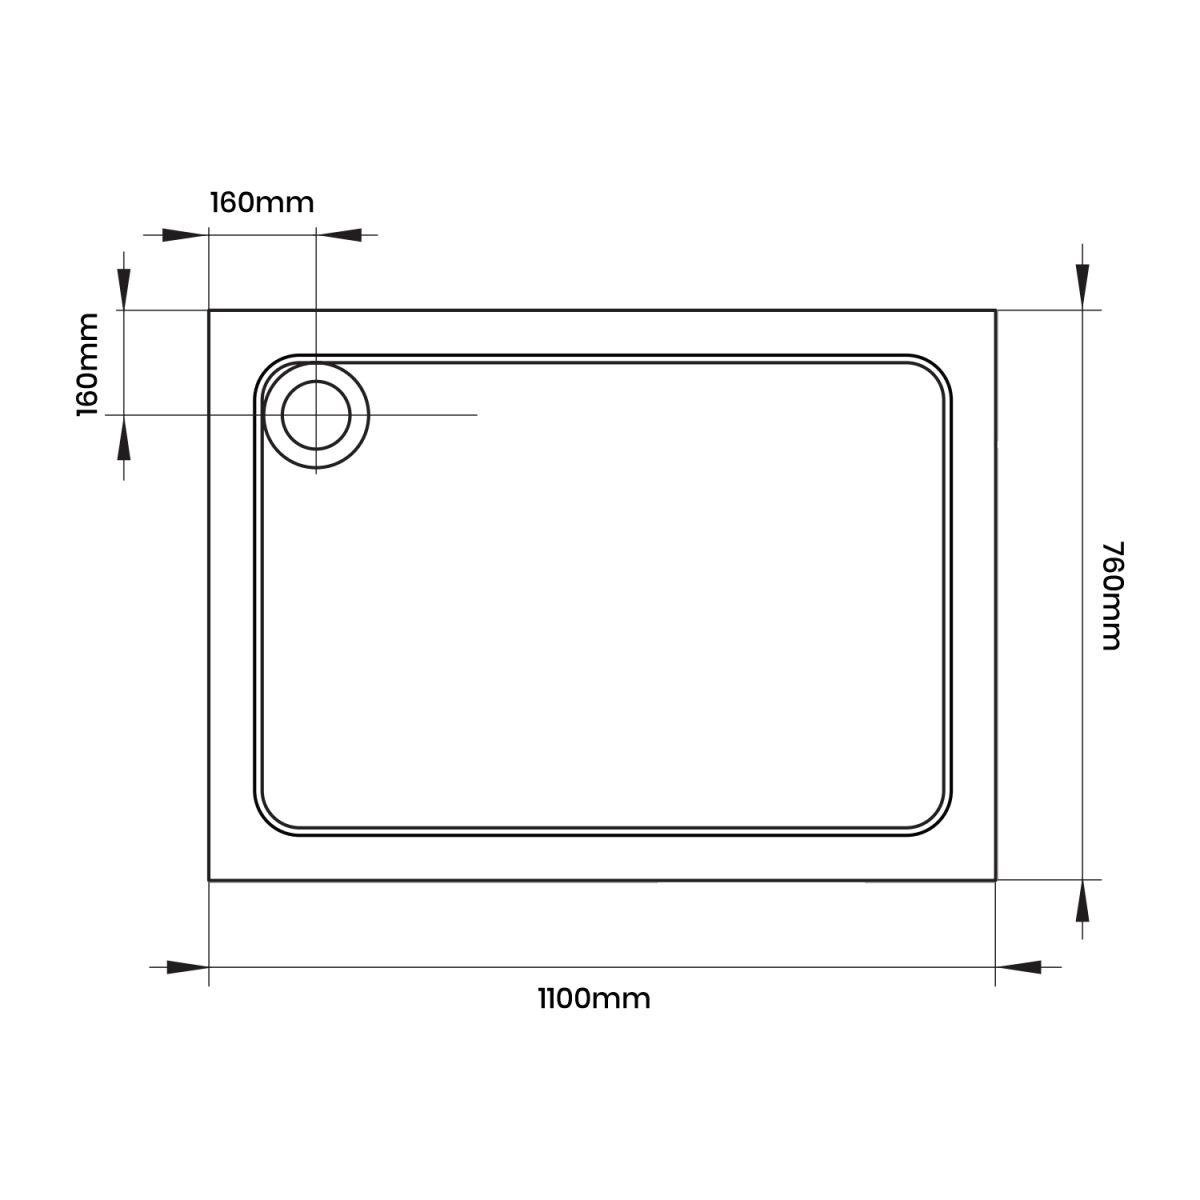 Aquadart Rectangular 1100 x 760 Shower Tray Dimensions